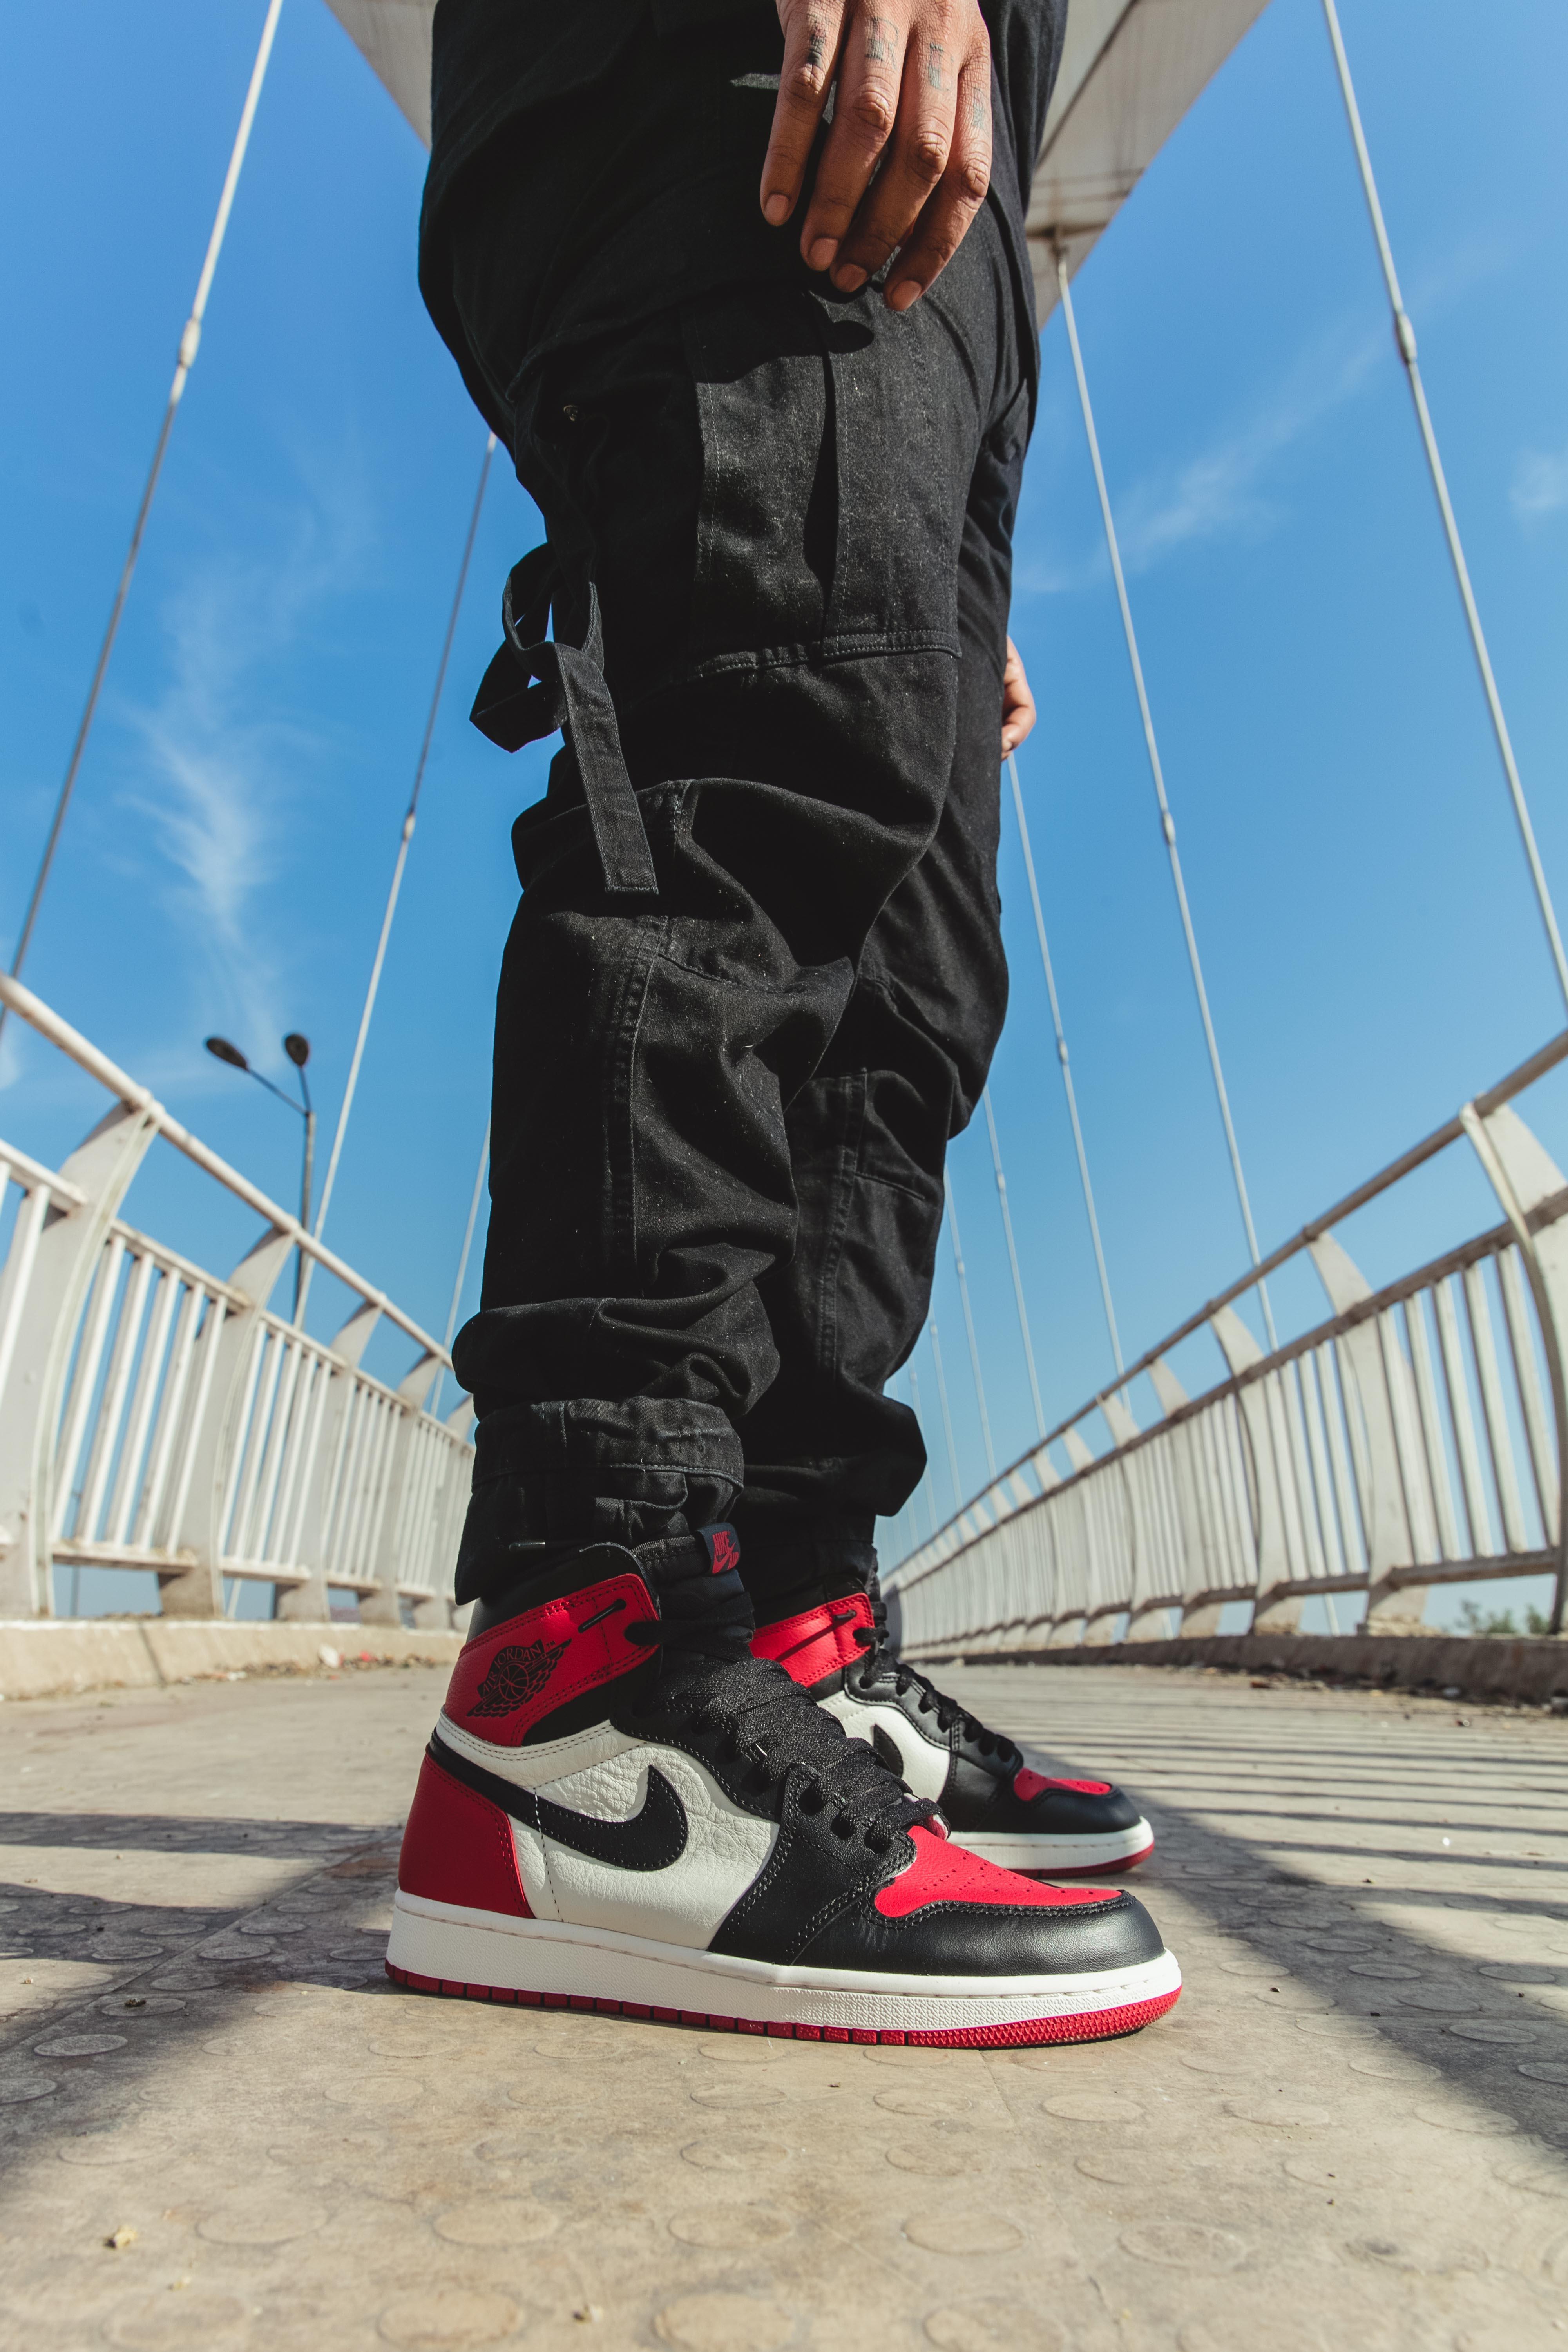 Streetwear Of Day Fit Retro – Air Bred The ToeSupreme Jordan 1 FKTlc1J3